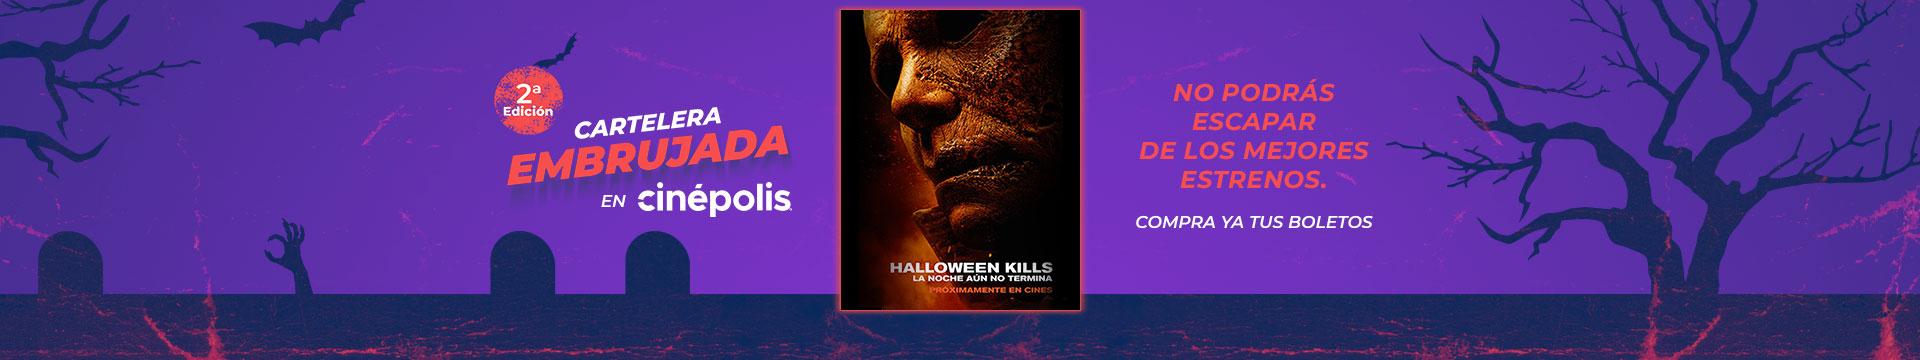 Estreno  Halloween Kills Cartelera Embrujada